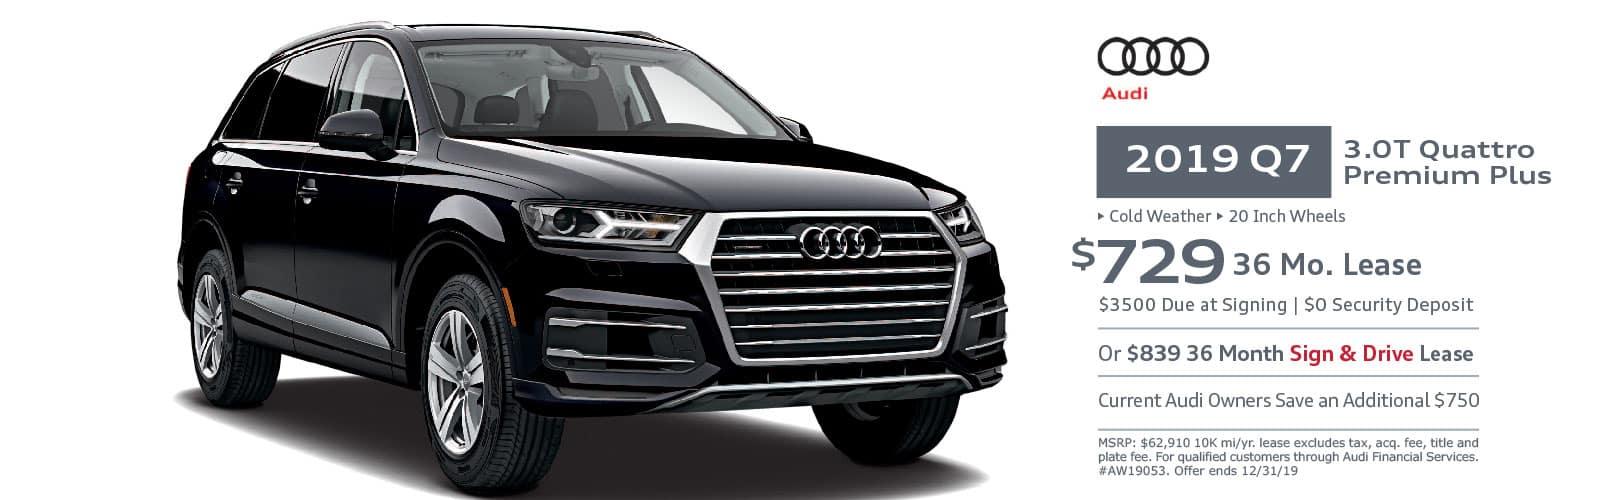 2017 Audi